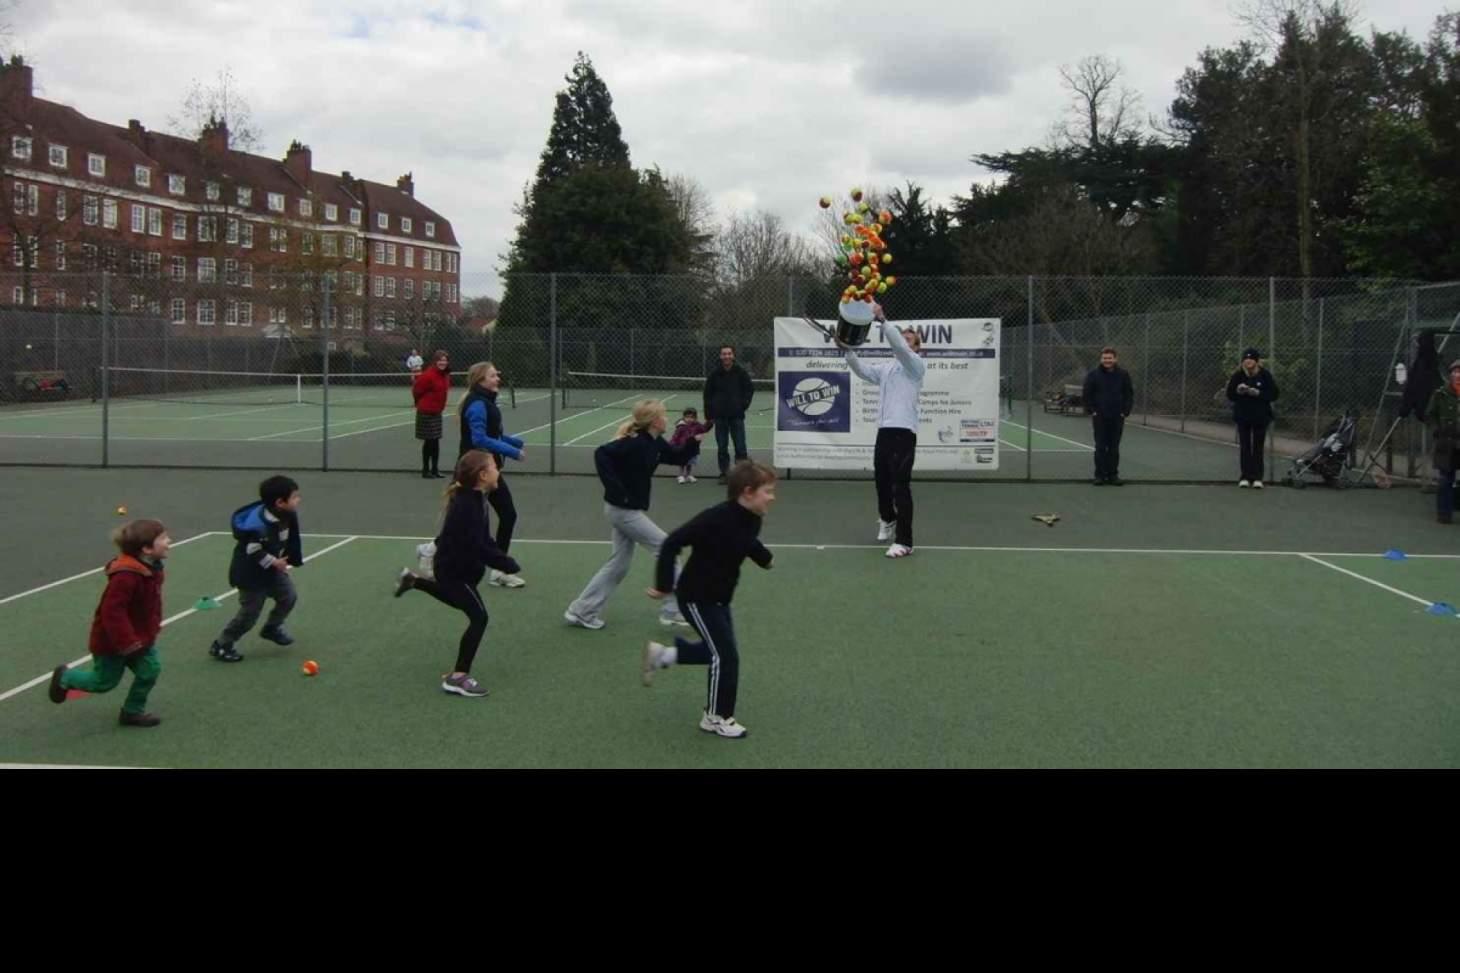 York House Gardens Outdoor   Hard (macadam) tennis court